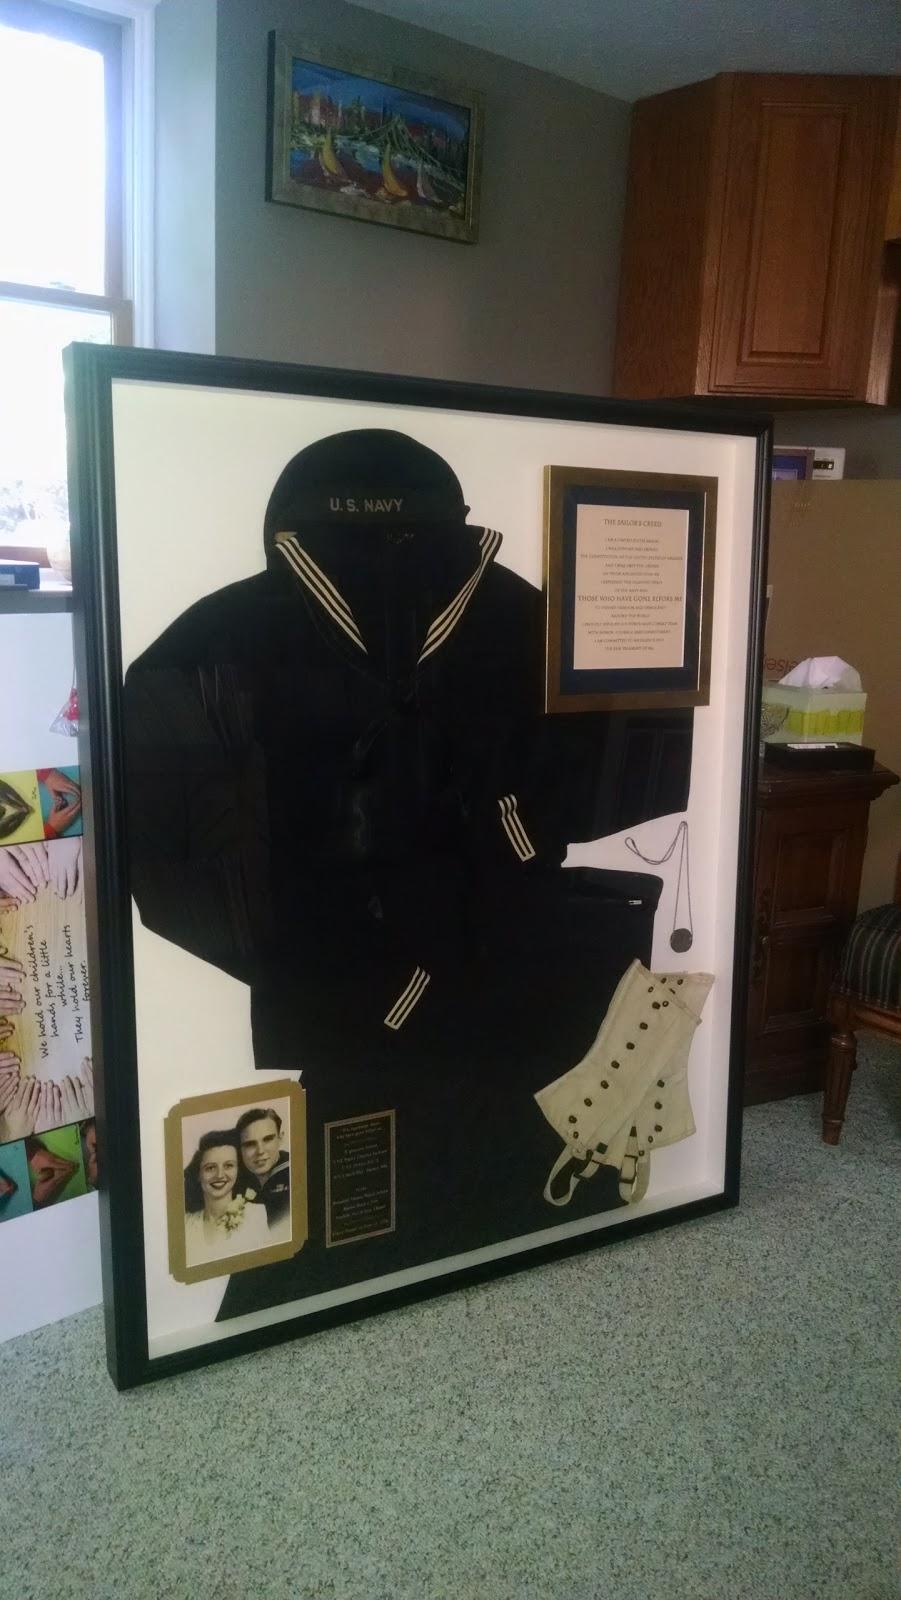 Innovate Frame & Design - store  | Photo 1 of 6 | Address: 31300 Arthur Rd, Solon, OH 44139, USA | Phone: (440) 567-0109